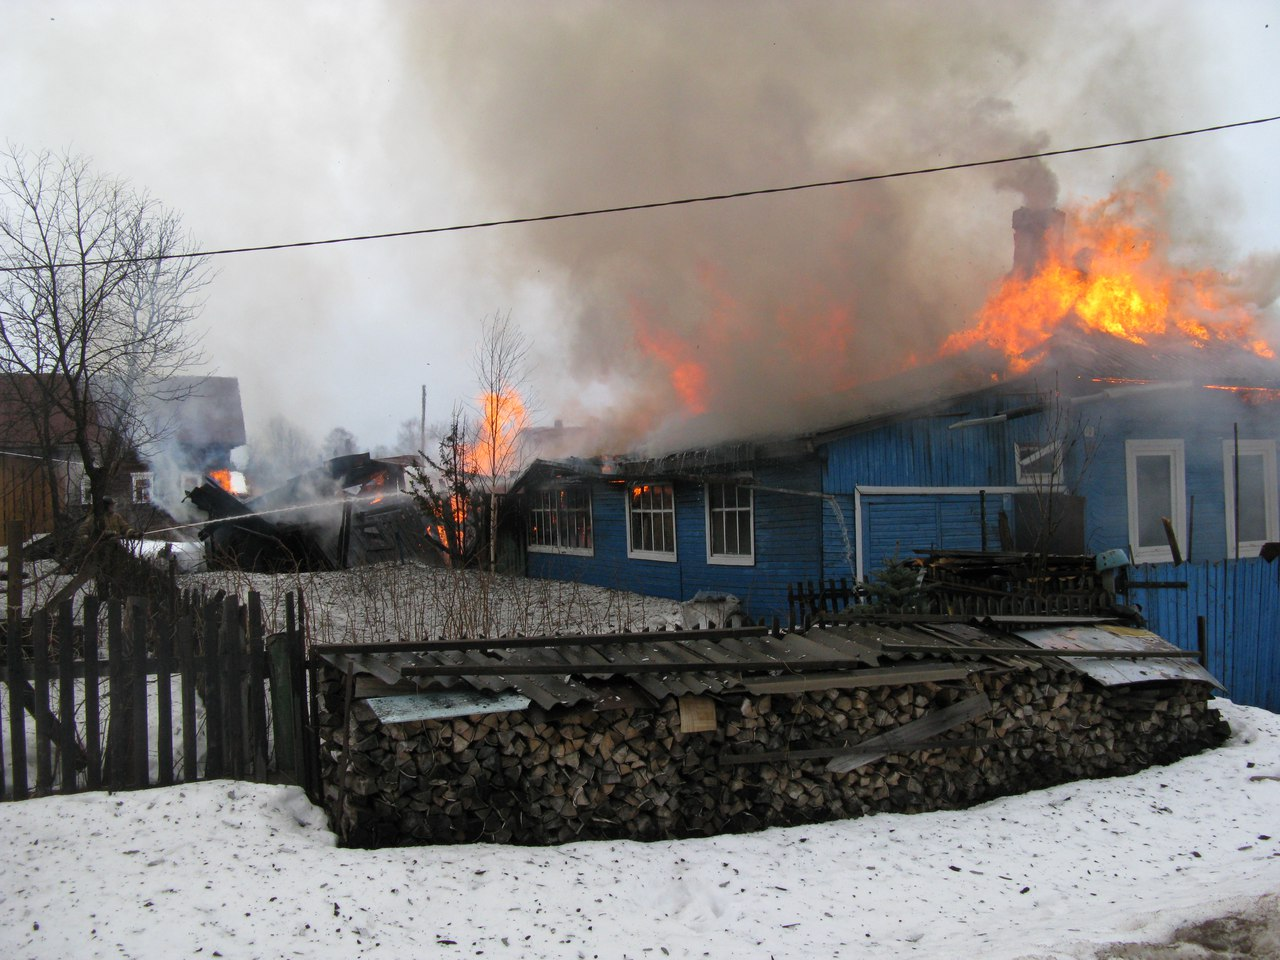 83-летний мужчина погиб во время пожара в Никольске